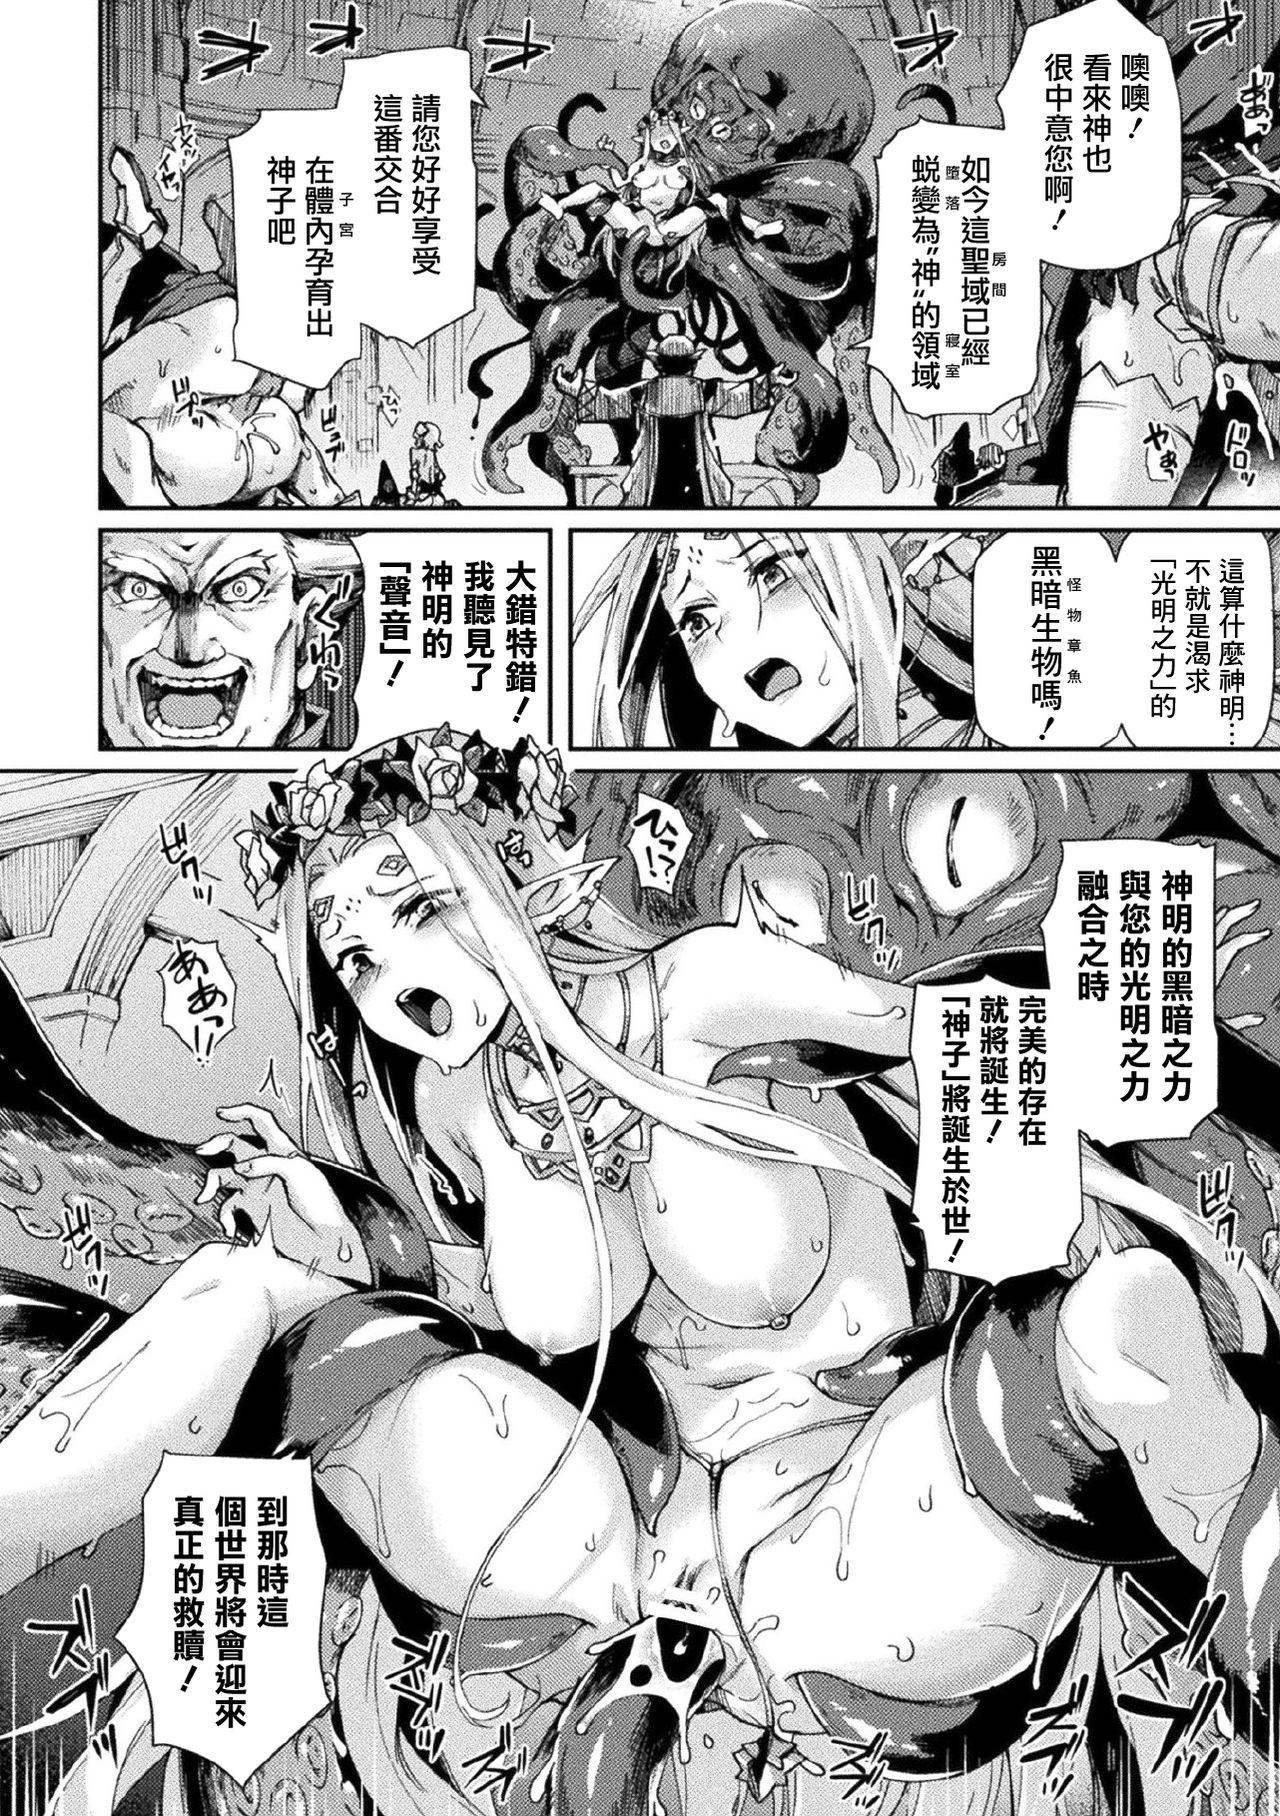 [Tsukitokage] Kuroinu II ~Inyoku ni Somaru Haitoku no Miyako, Futatabi~ THE COMIC Chapter 8 (Kukkoro Heroines Vol. 11) [Digital] [Chinese] [鬼畜王漢化組] [Digital] 12